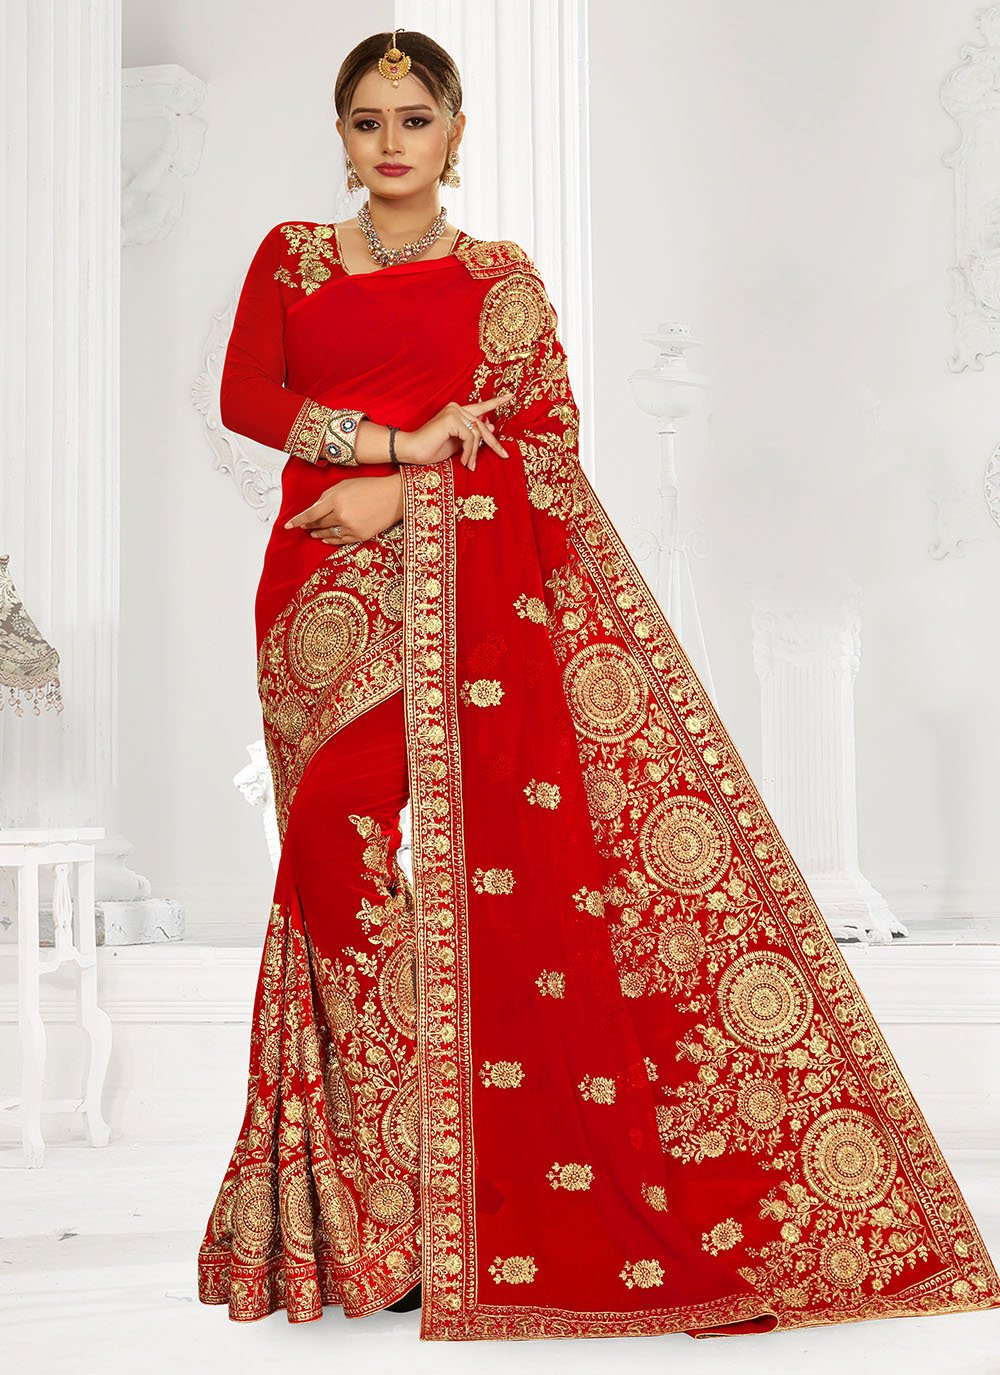 Georgette Embroidered Red Designer Bridal Sarees